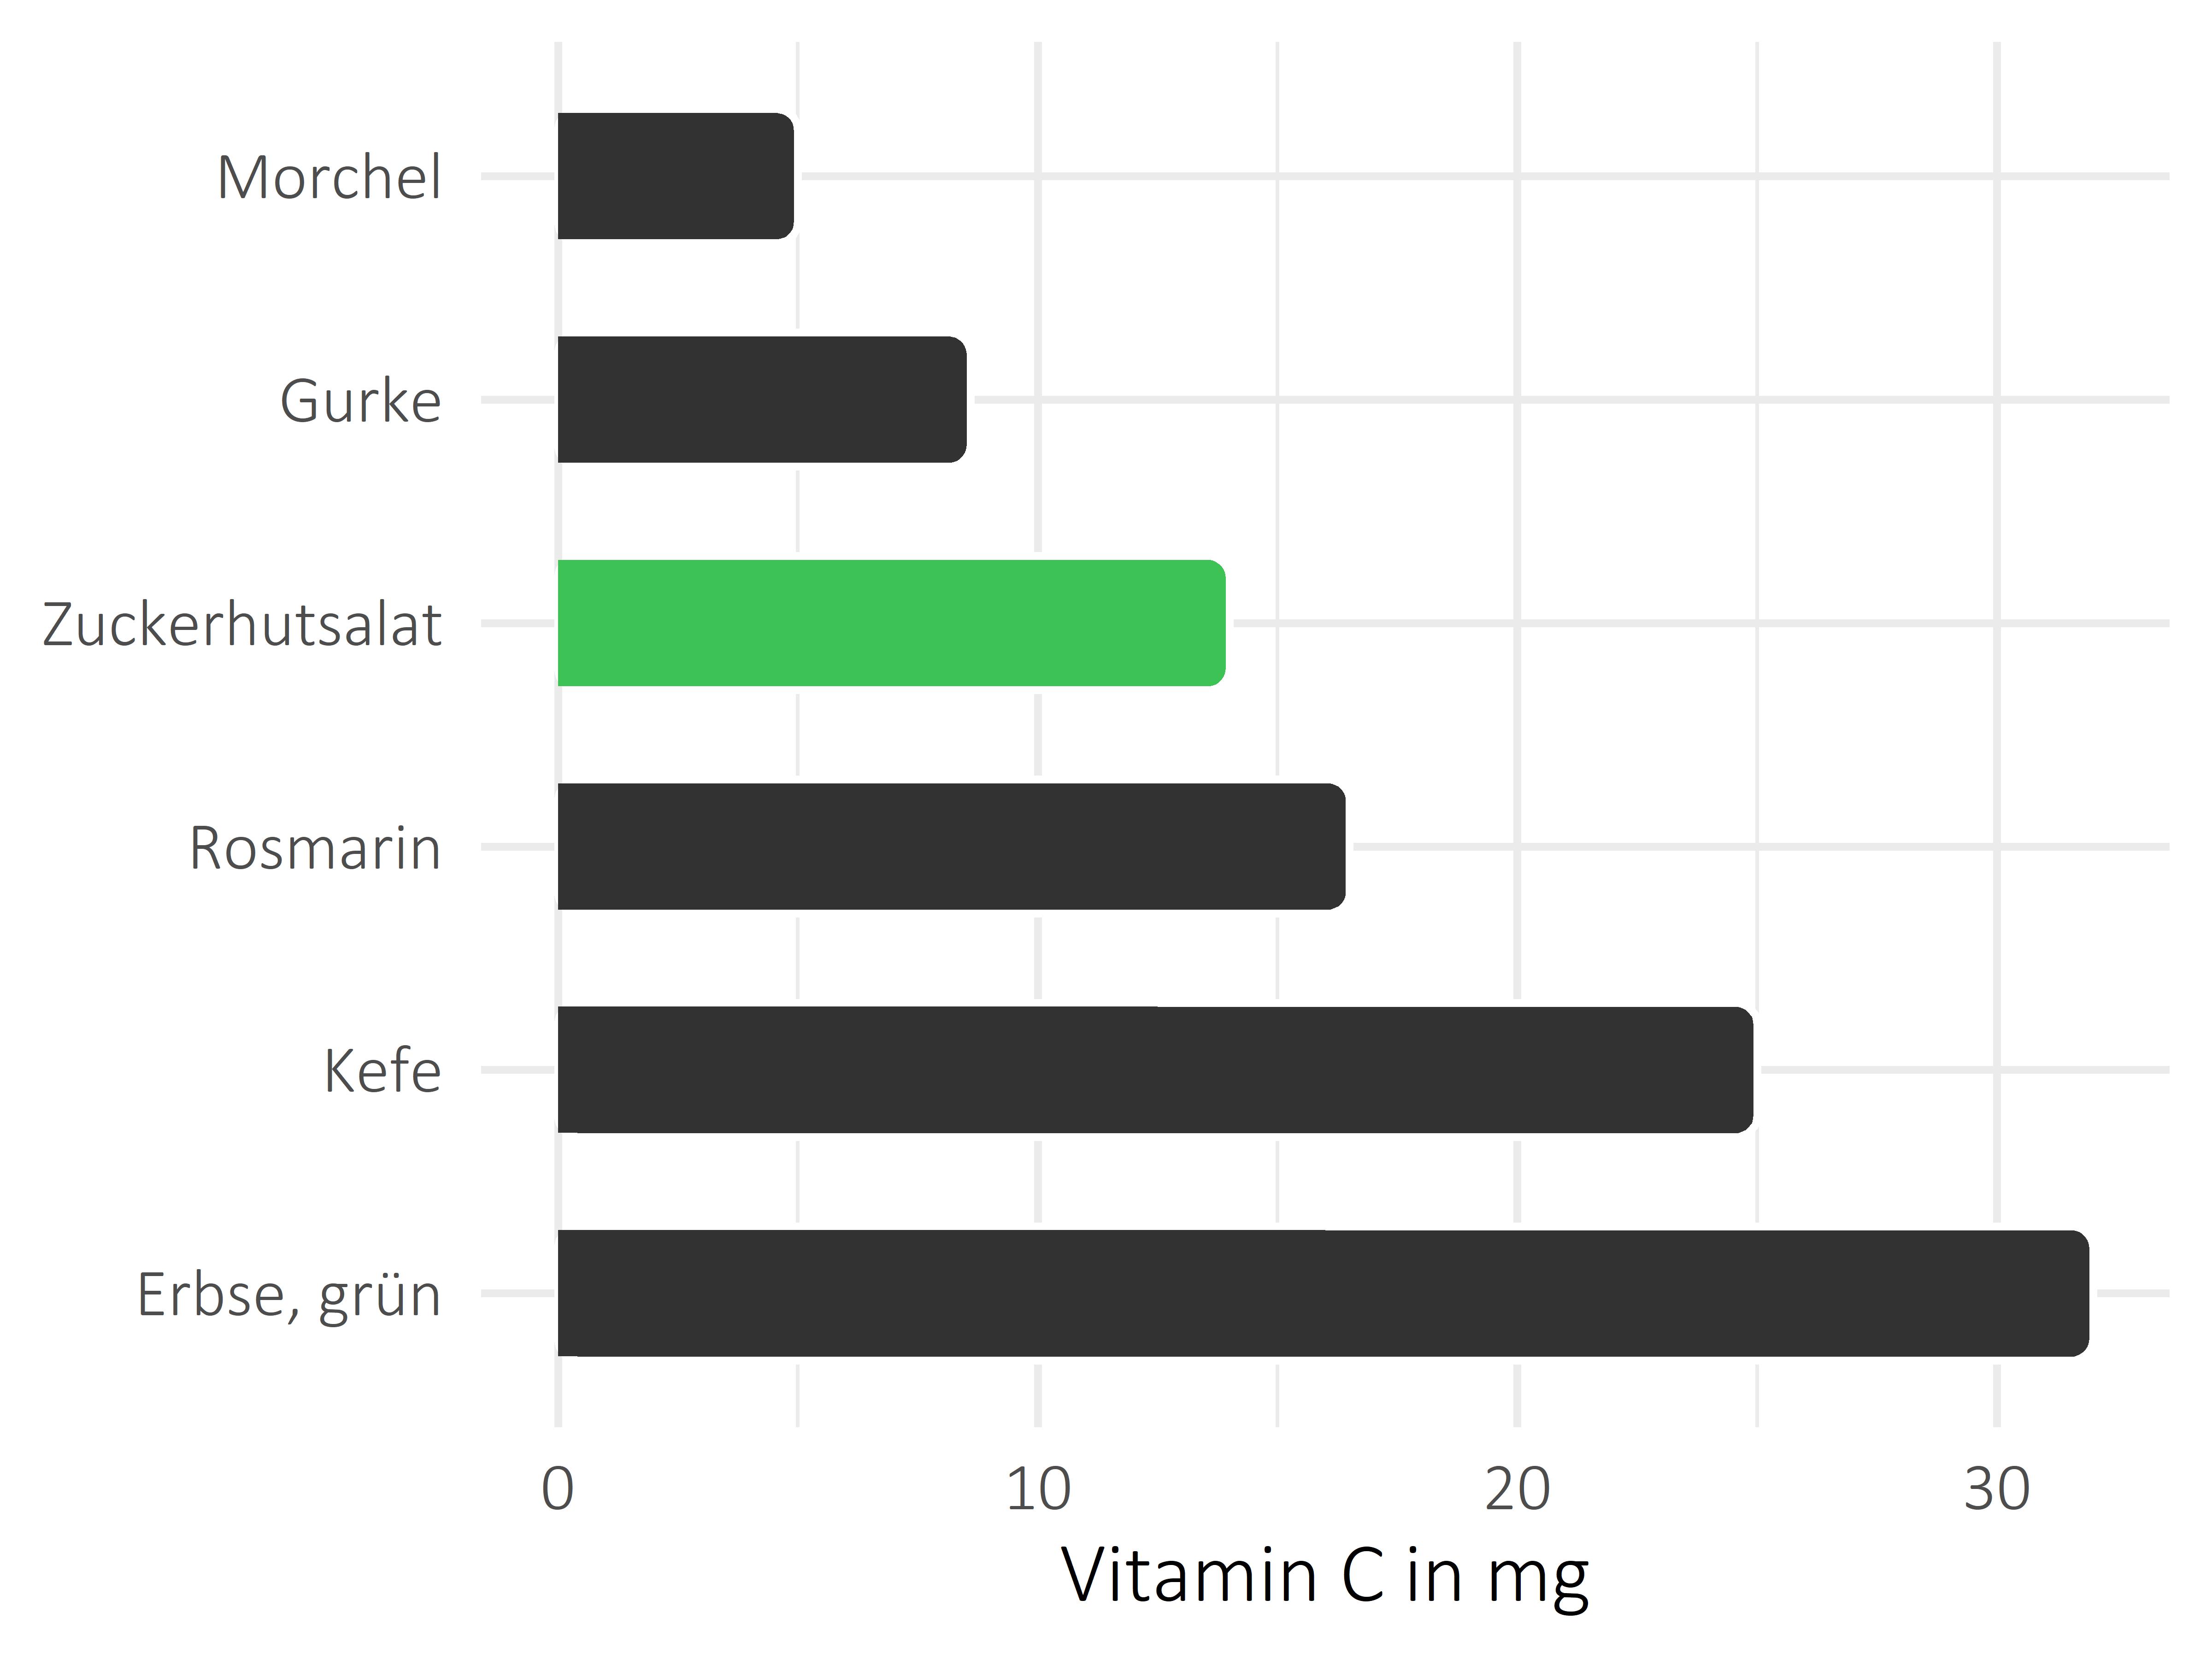 Gemüsesorten Ascorbinsäure